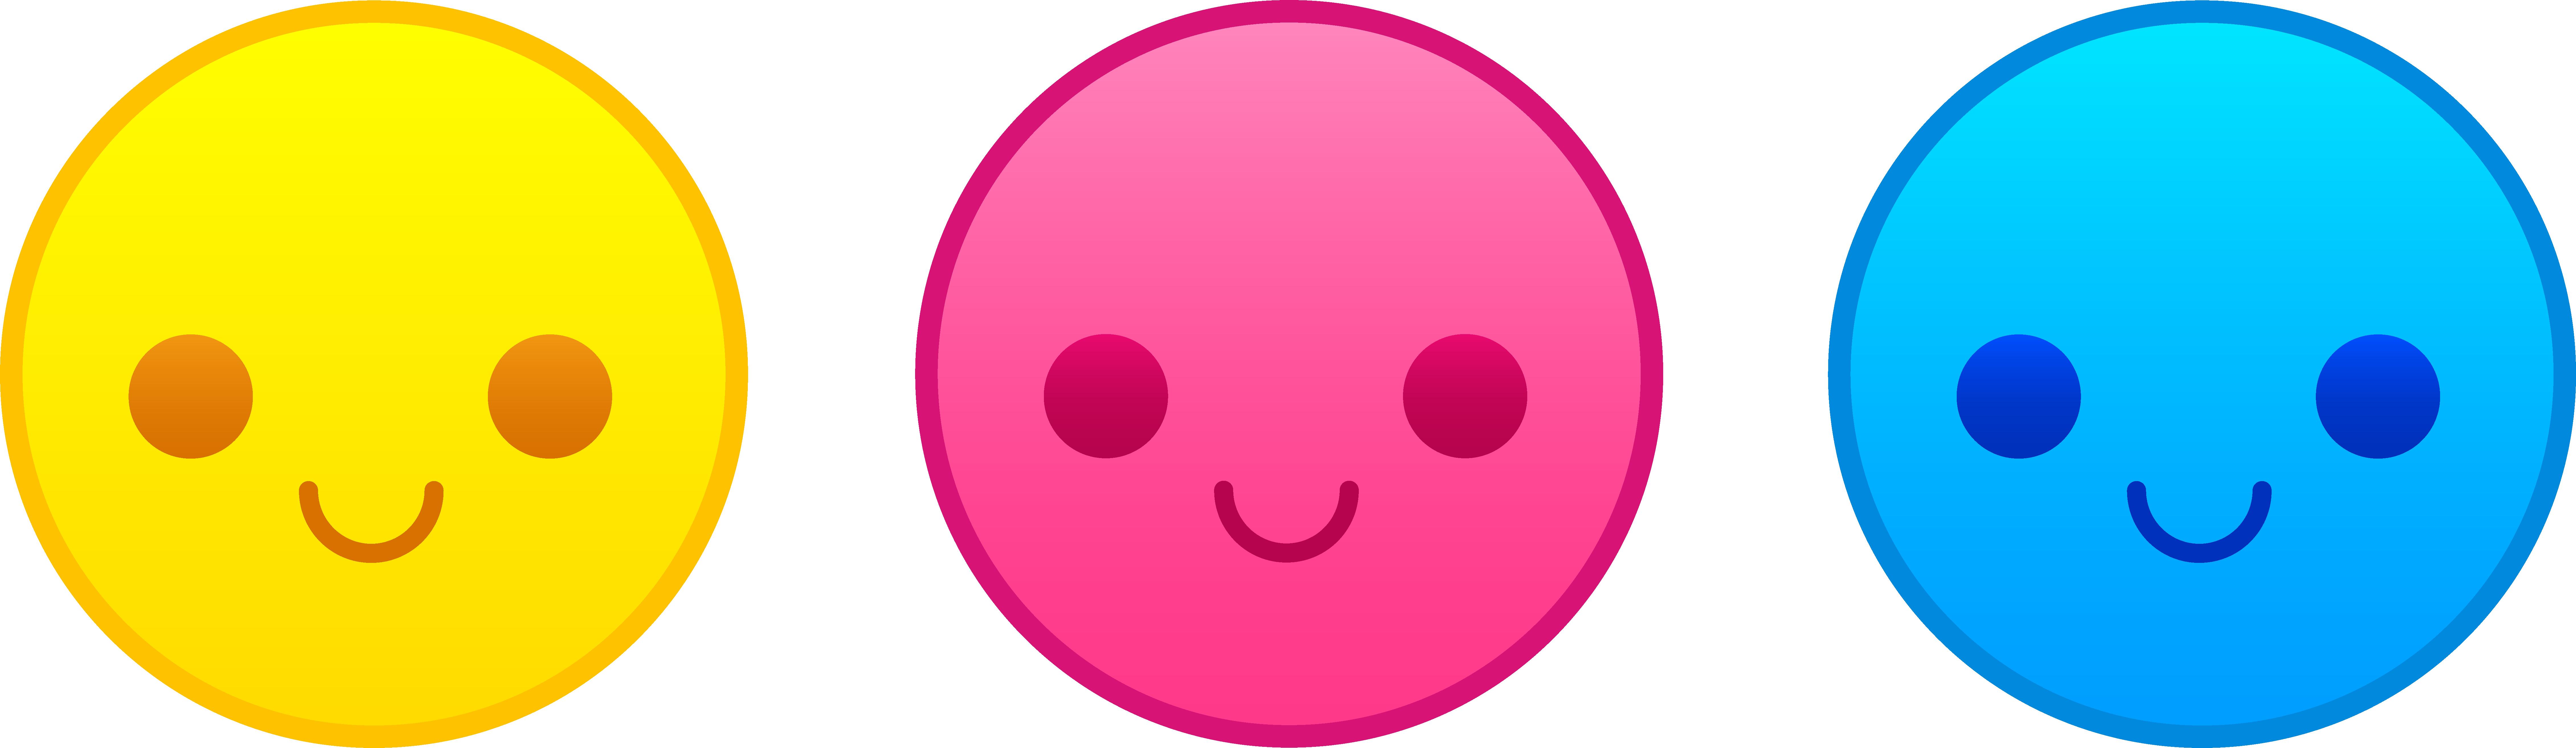 9039x2626 Happy Face Smiley Face Happy Star Clip Art Image